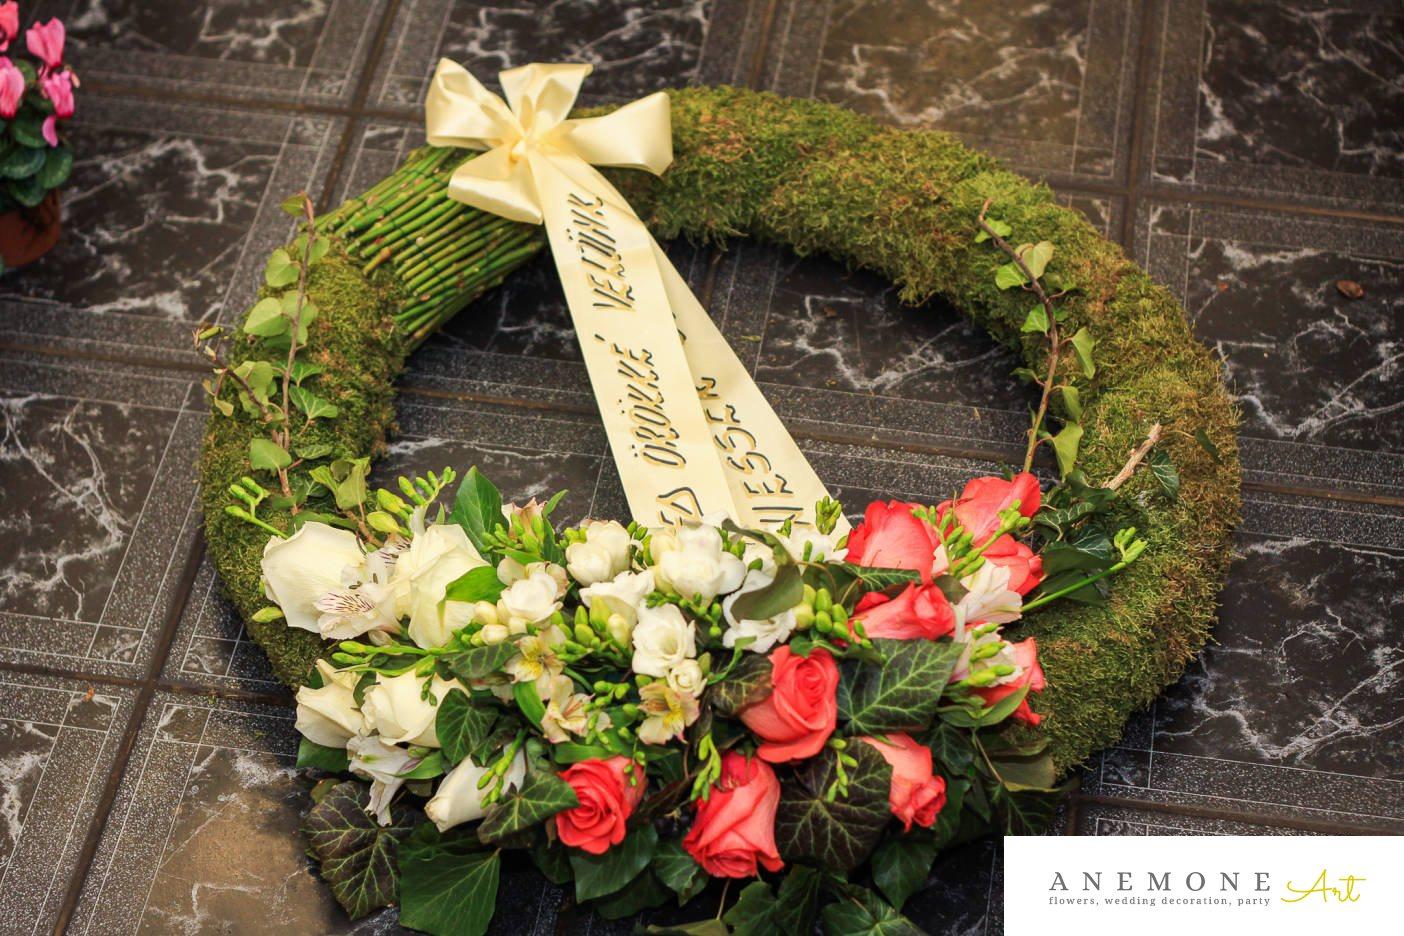 Poza, foto cu Flori de nunta alb, coroana funerara, muschi, rosu, trandafiri in Arad, Timisoara, Oradea (wedding flowers, bouquets) nunta Arad, Timisoara, Oradea